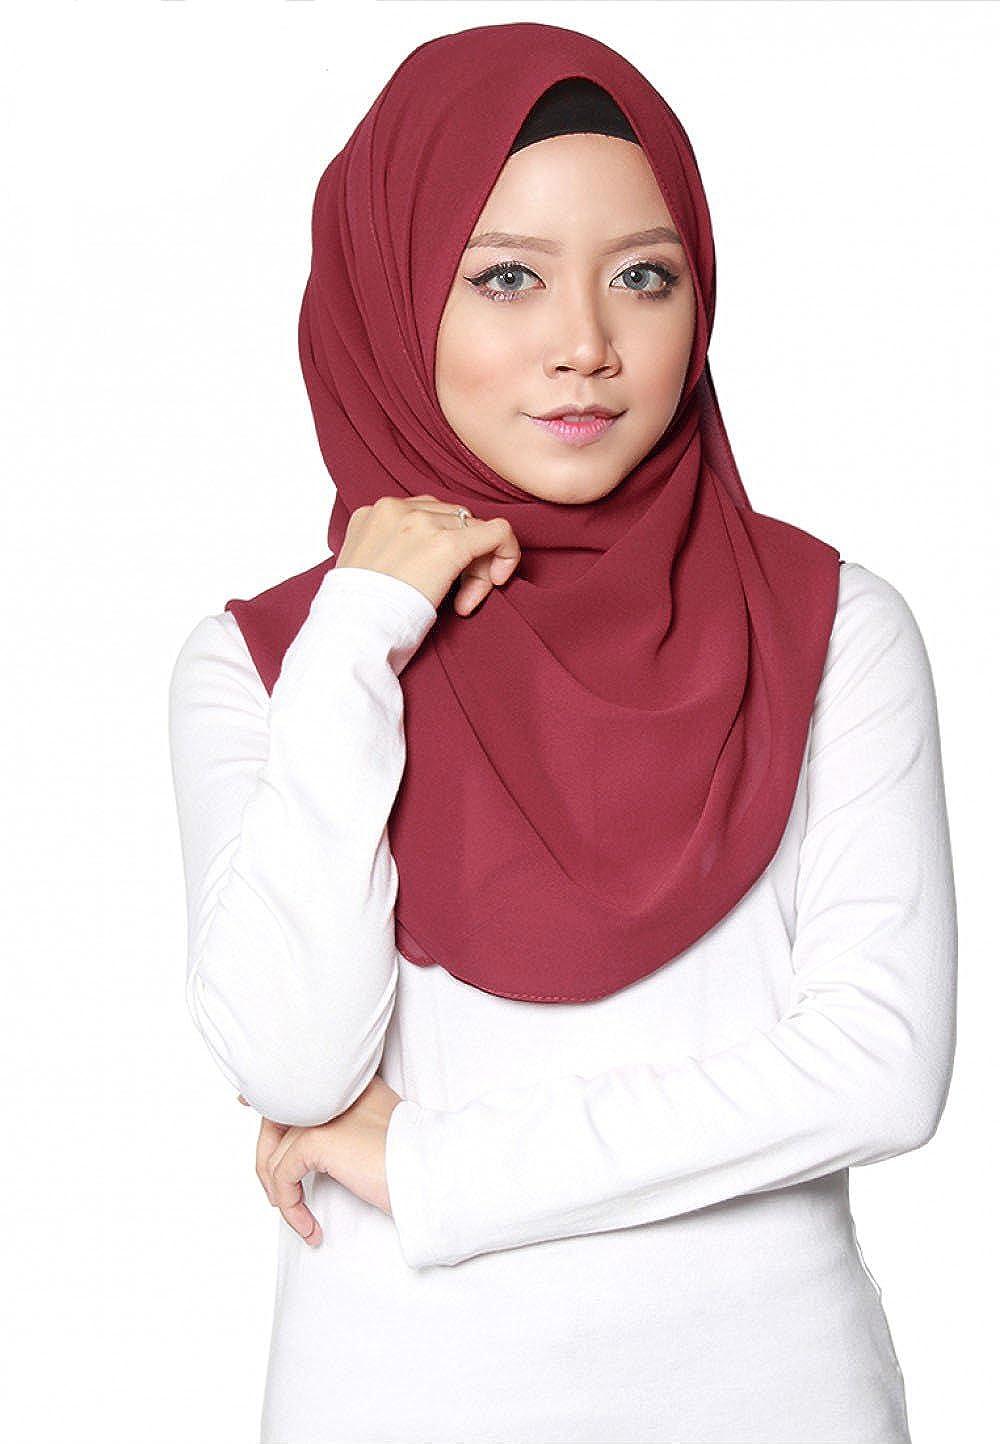 SAFIYA - Hijab per donne musulmane velate | Foulard velo turbante sciarpa pashmina scialle islamico cuffia abaya | Chiffon | Bordò - 75x180cm ✅ HBCFNBORDEAUX